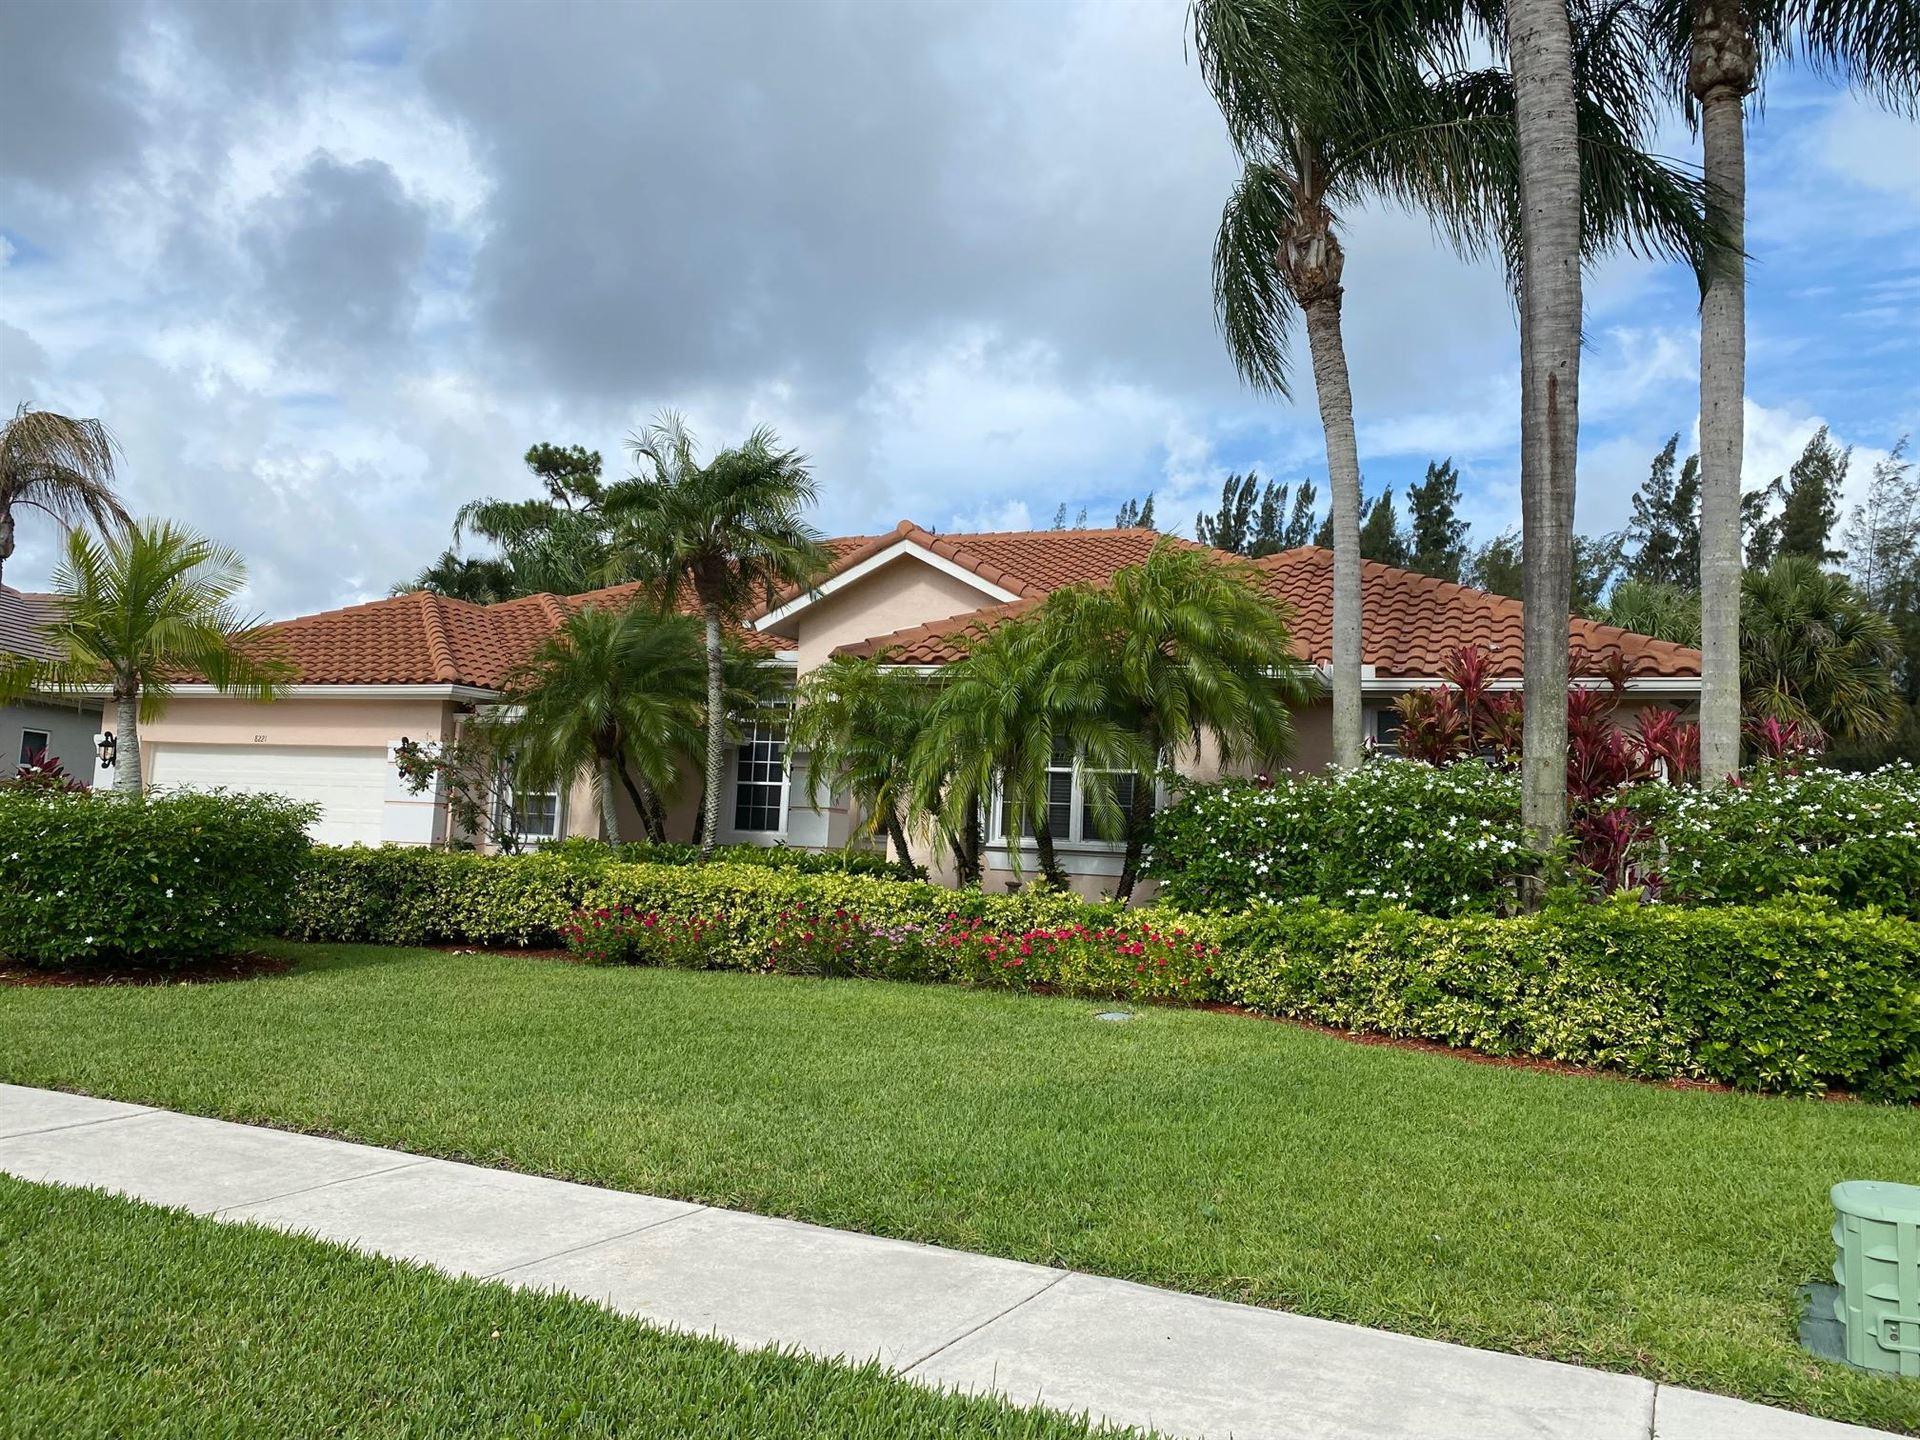 8221 Muirhead Circle, Boynton Beach, FL 33472 - MLS#: RX-10722622